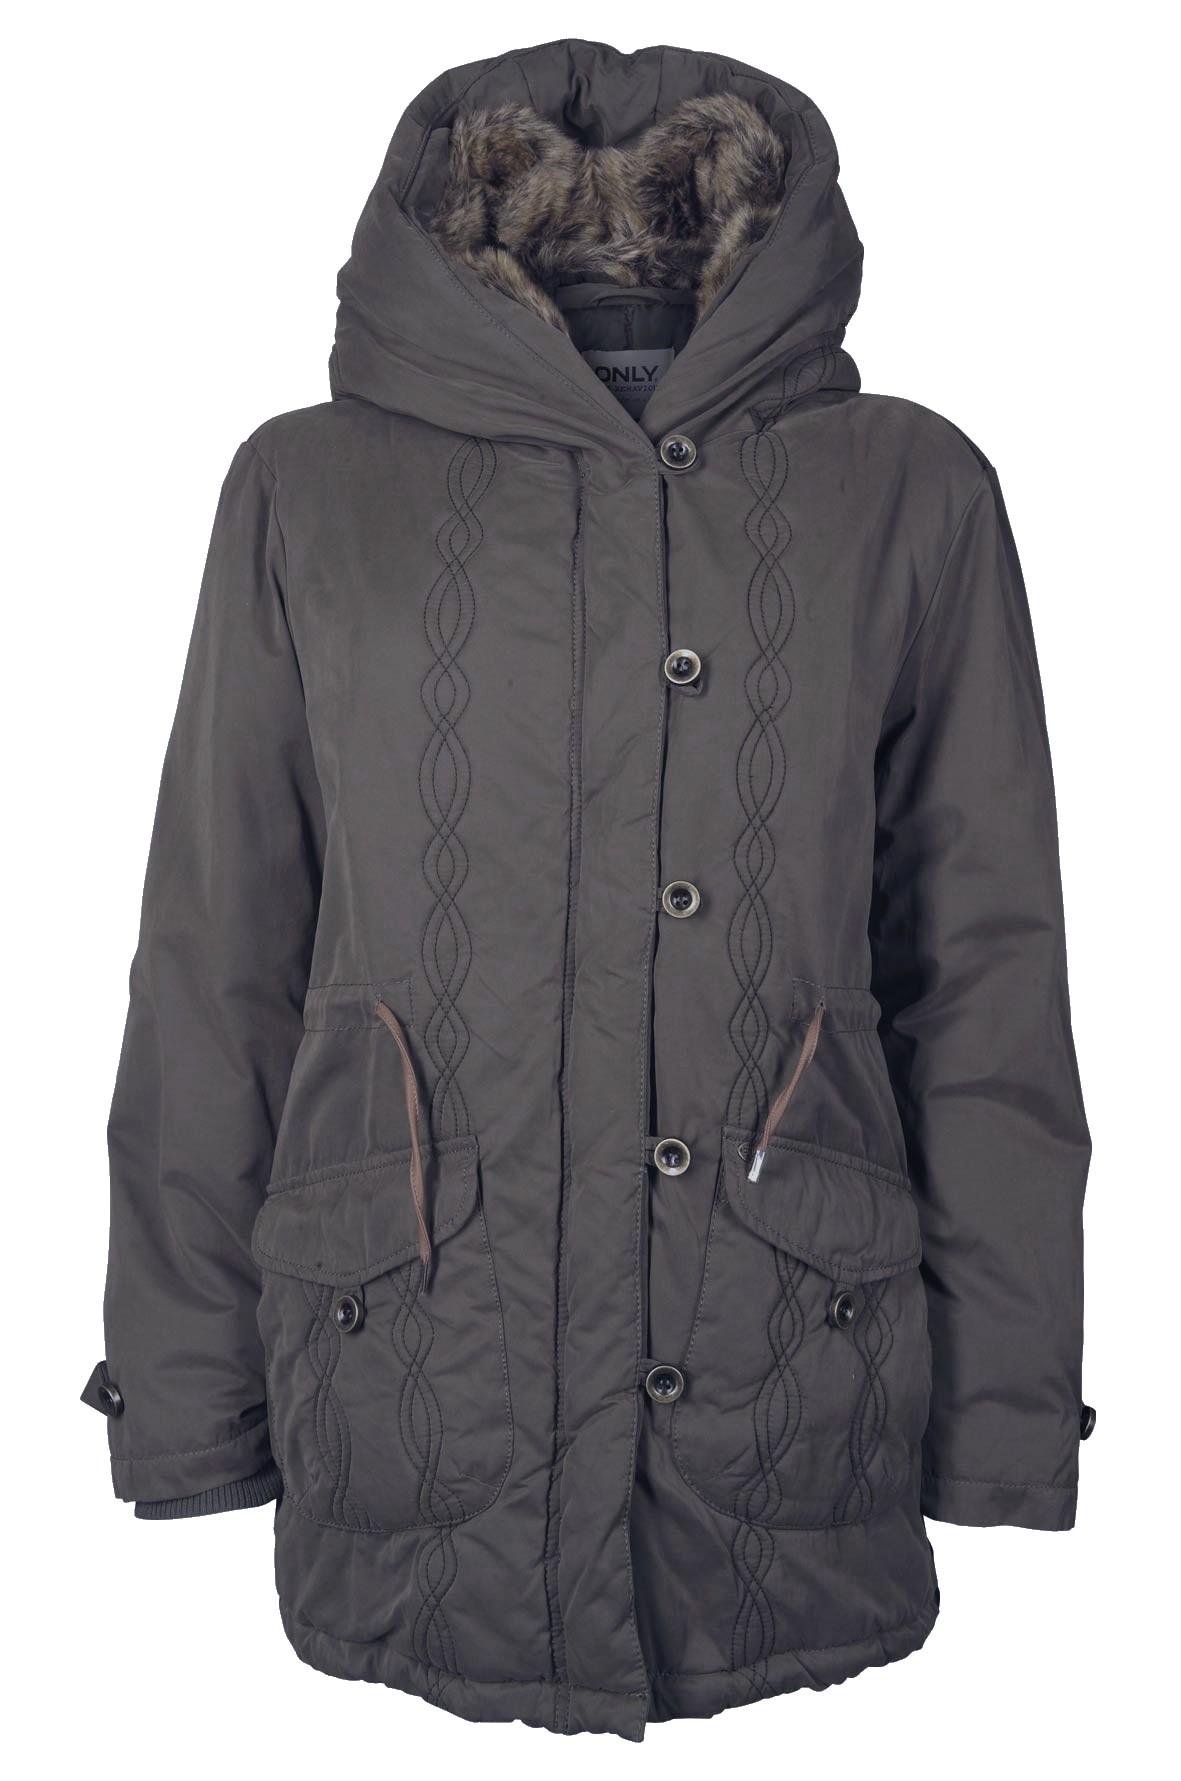 Details zu Only Damen Mantel XS, S, M, L, XL New Astoria Canvas Jacket ...